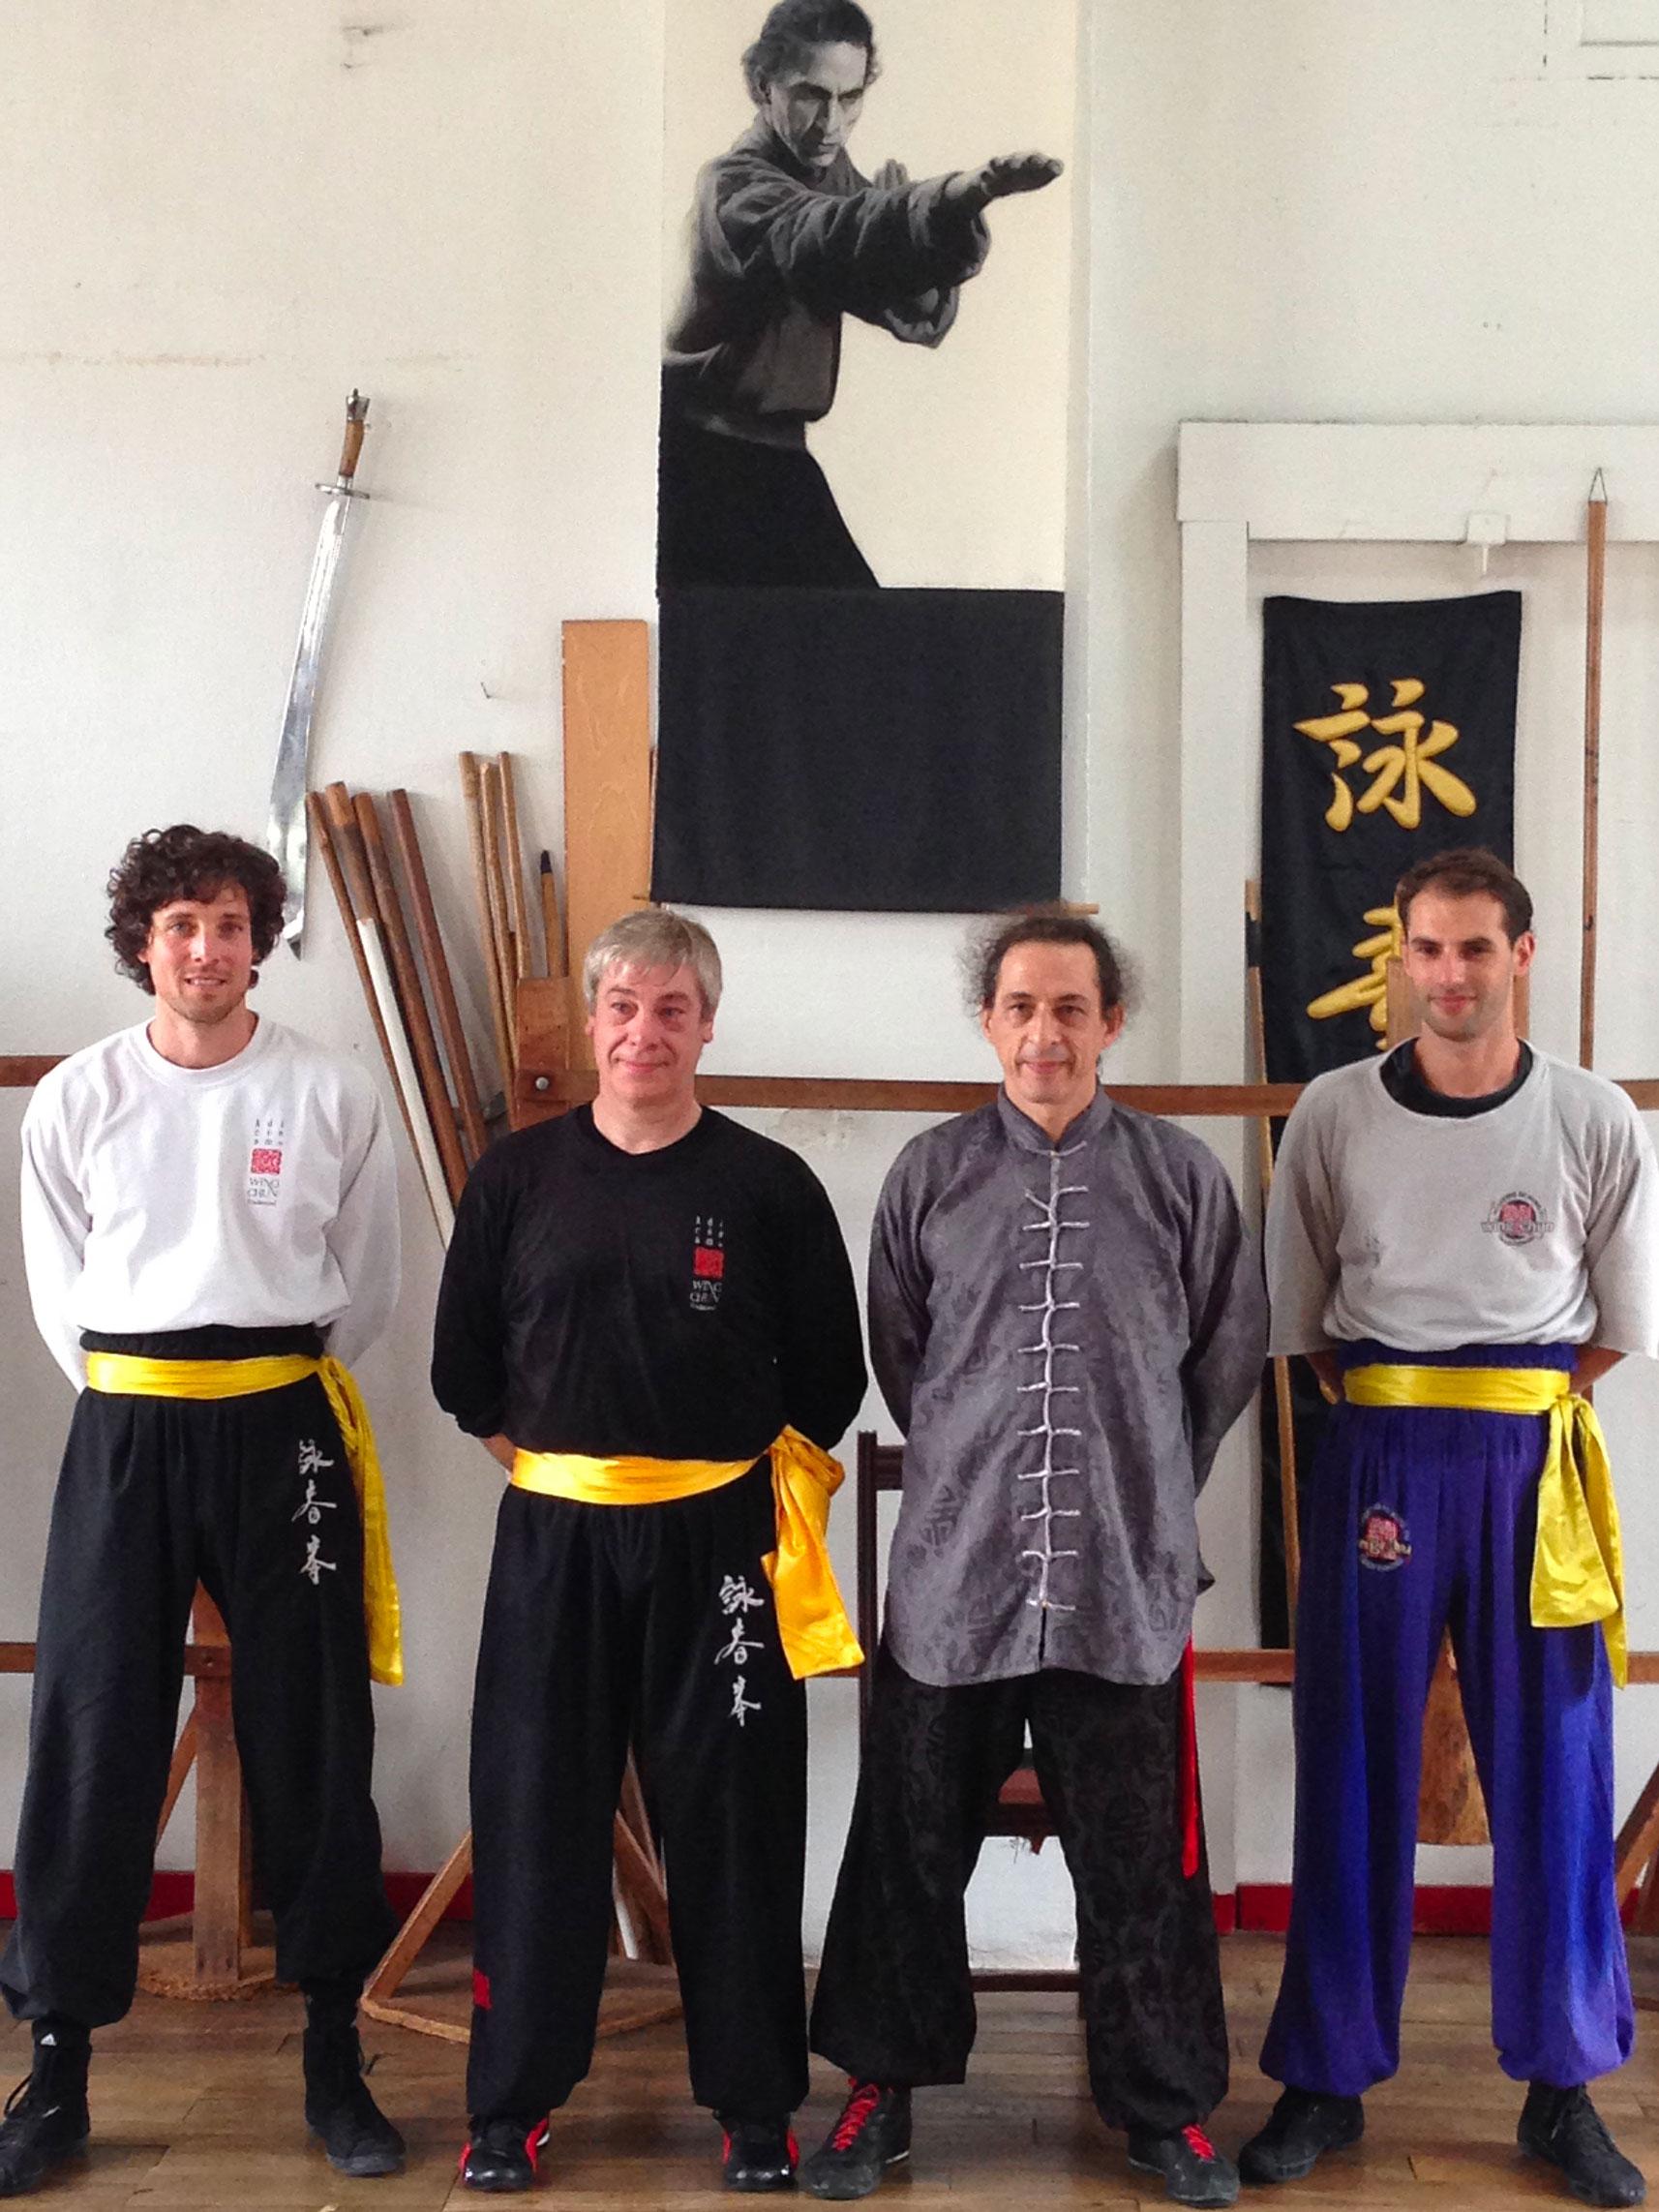 Didier Beddar, Adrien Jeunemaitre, Johan Merley, Herve Camellini